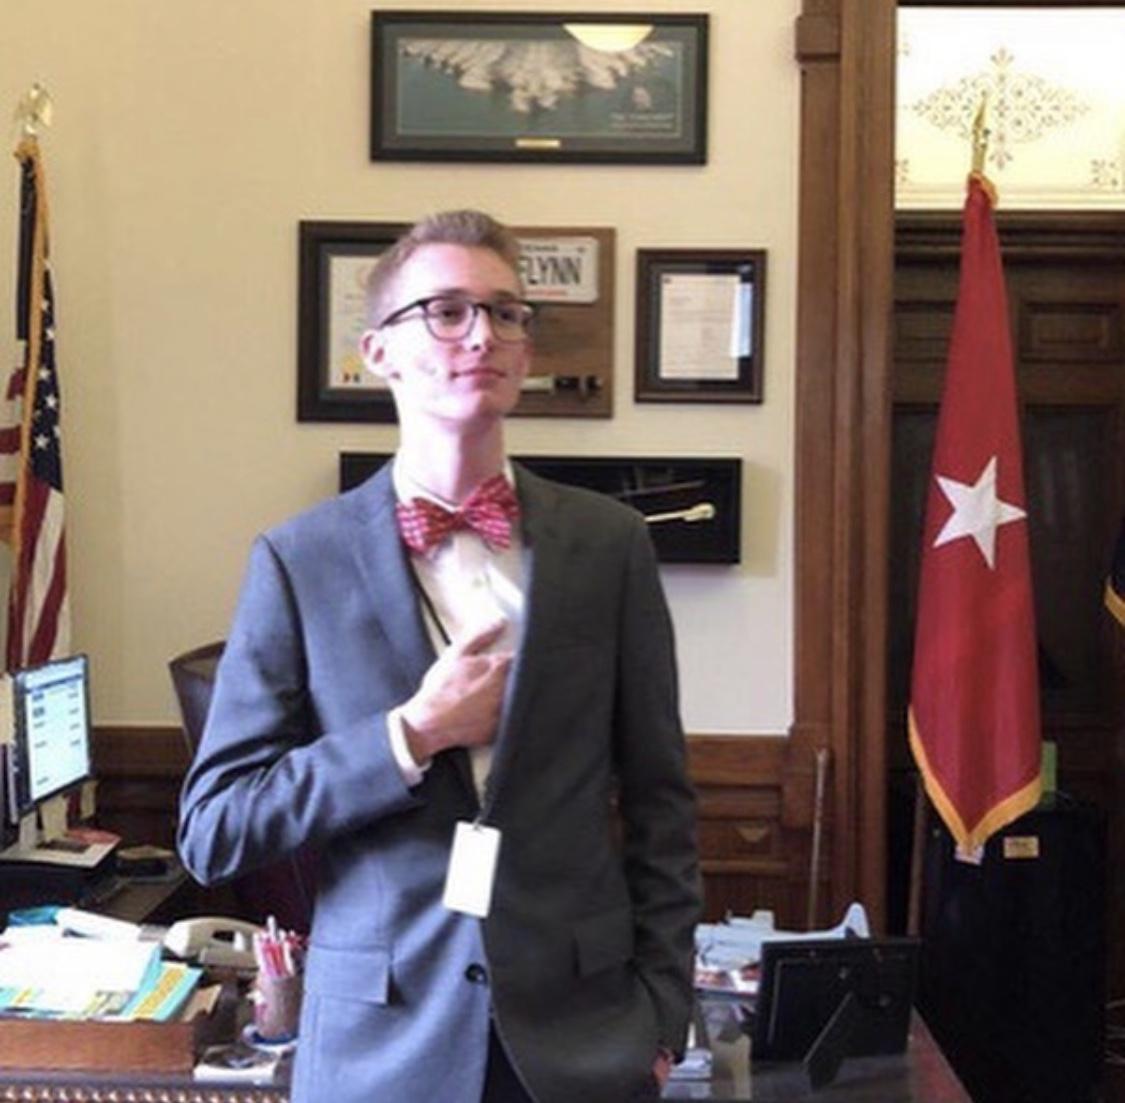 Kyle Legg posing in the House of Representatives.